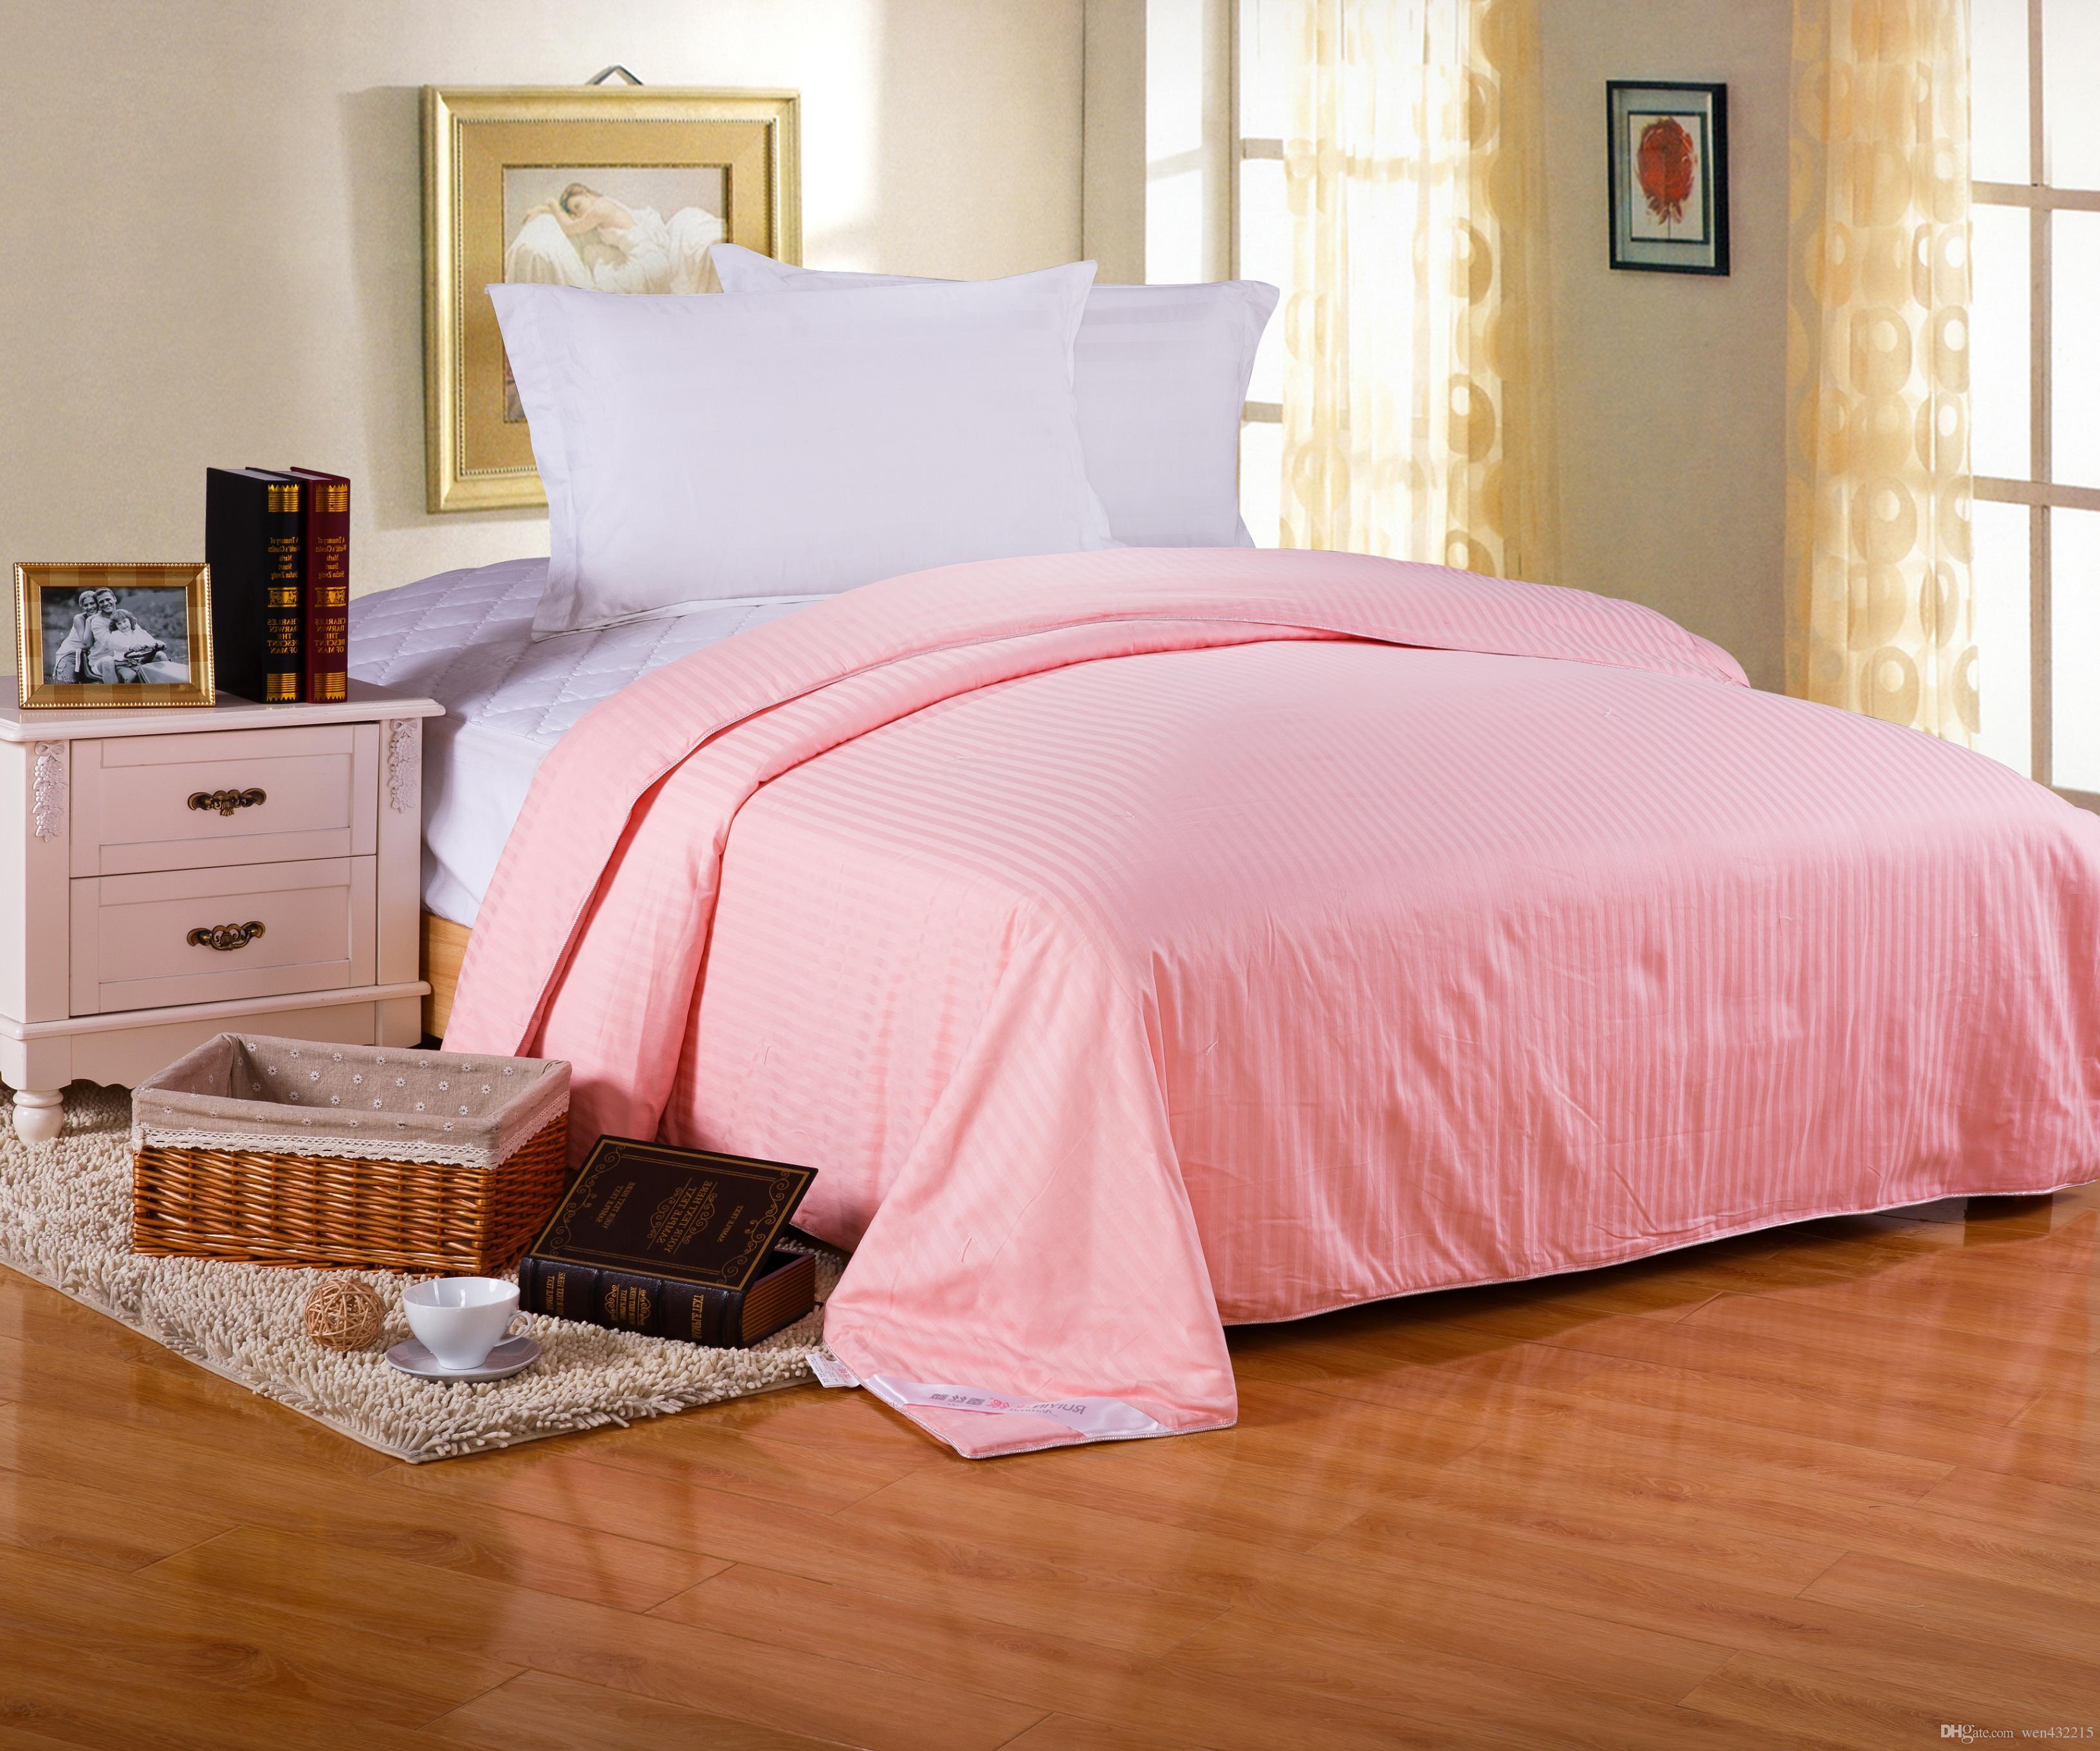 comforter gold mulberry faux silk pin splendor dark bedding shirred